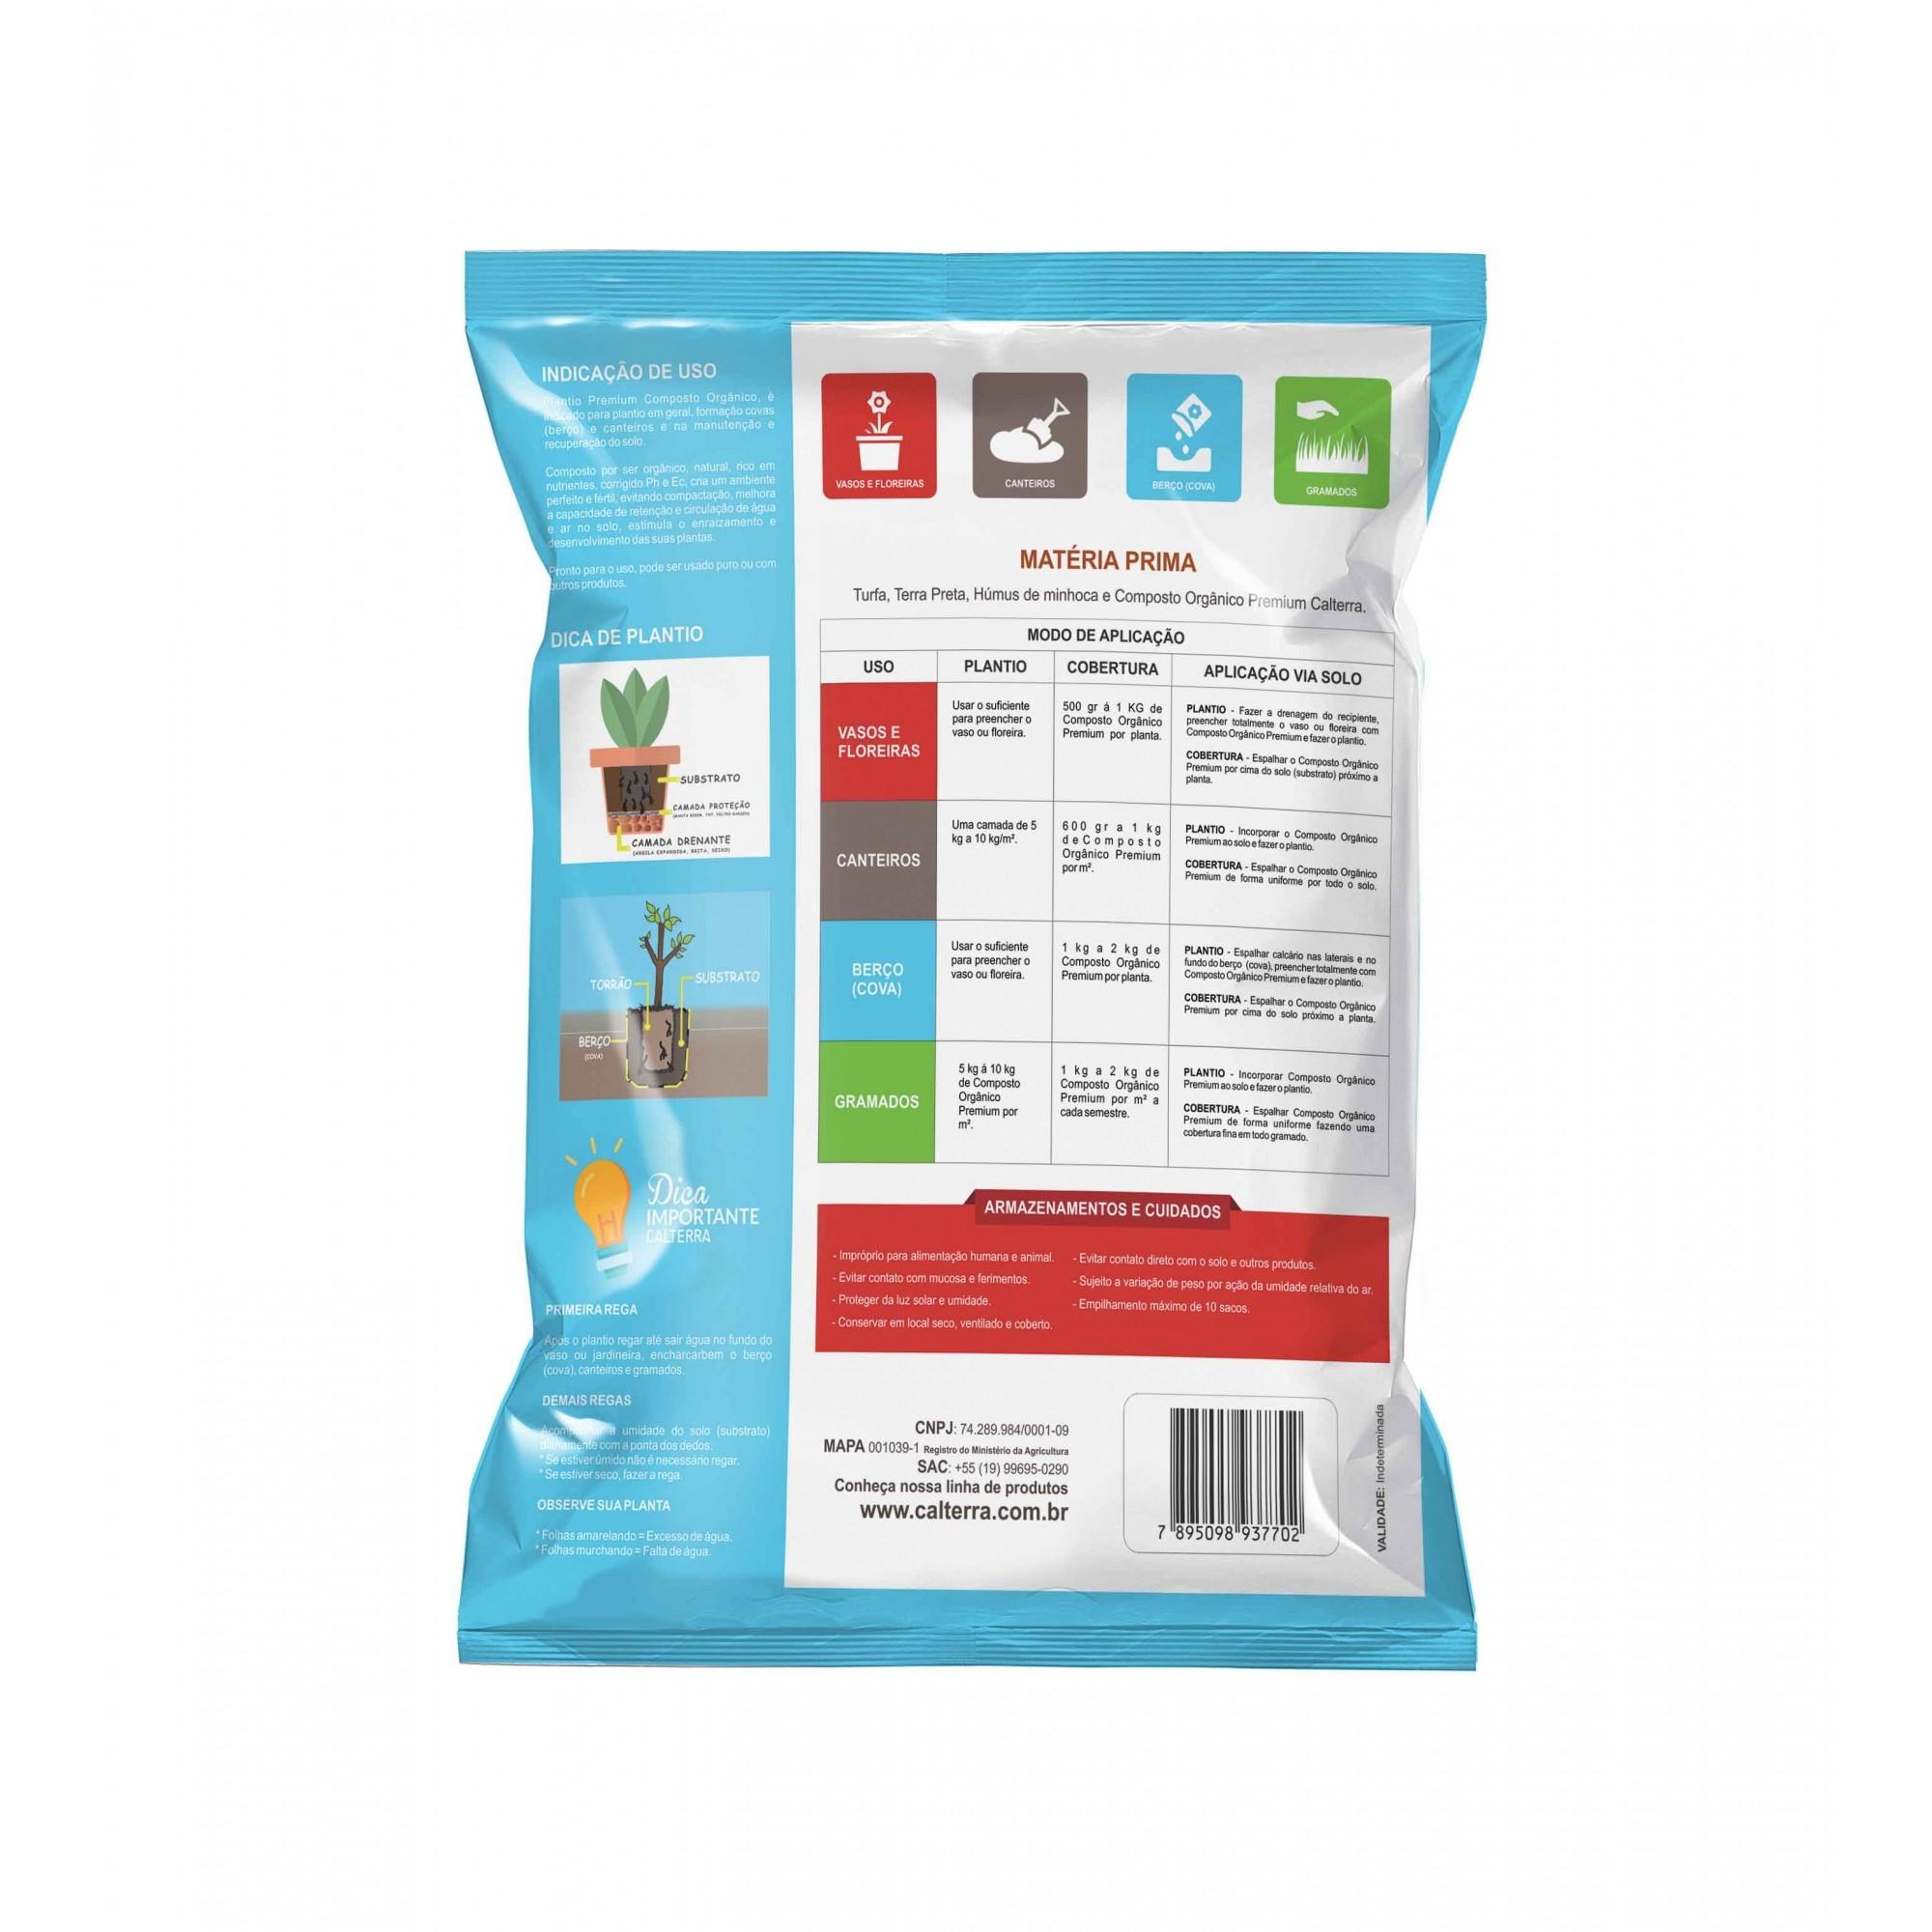 Substrato Plantio Premium Composto Orgânico 25kg Calterra